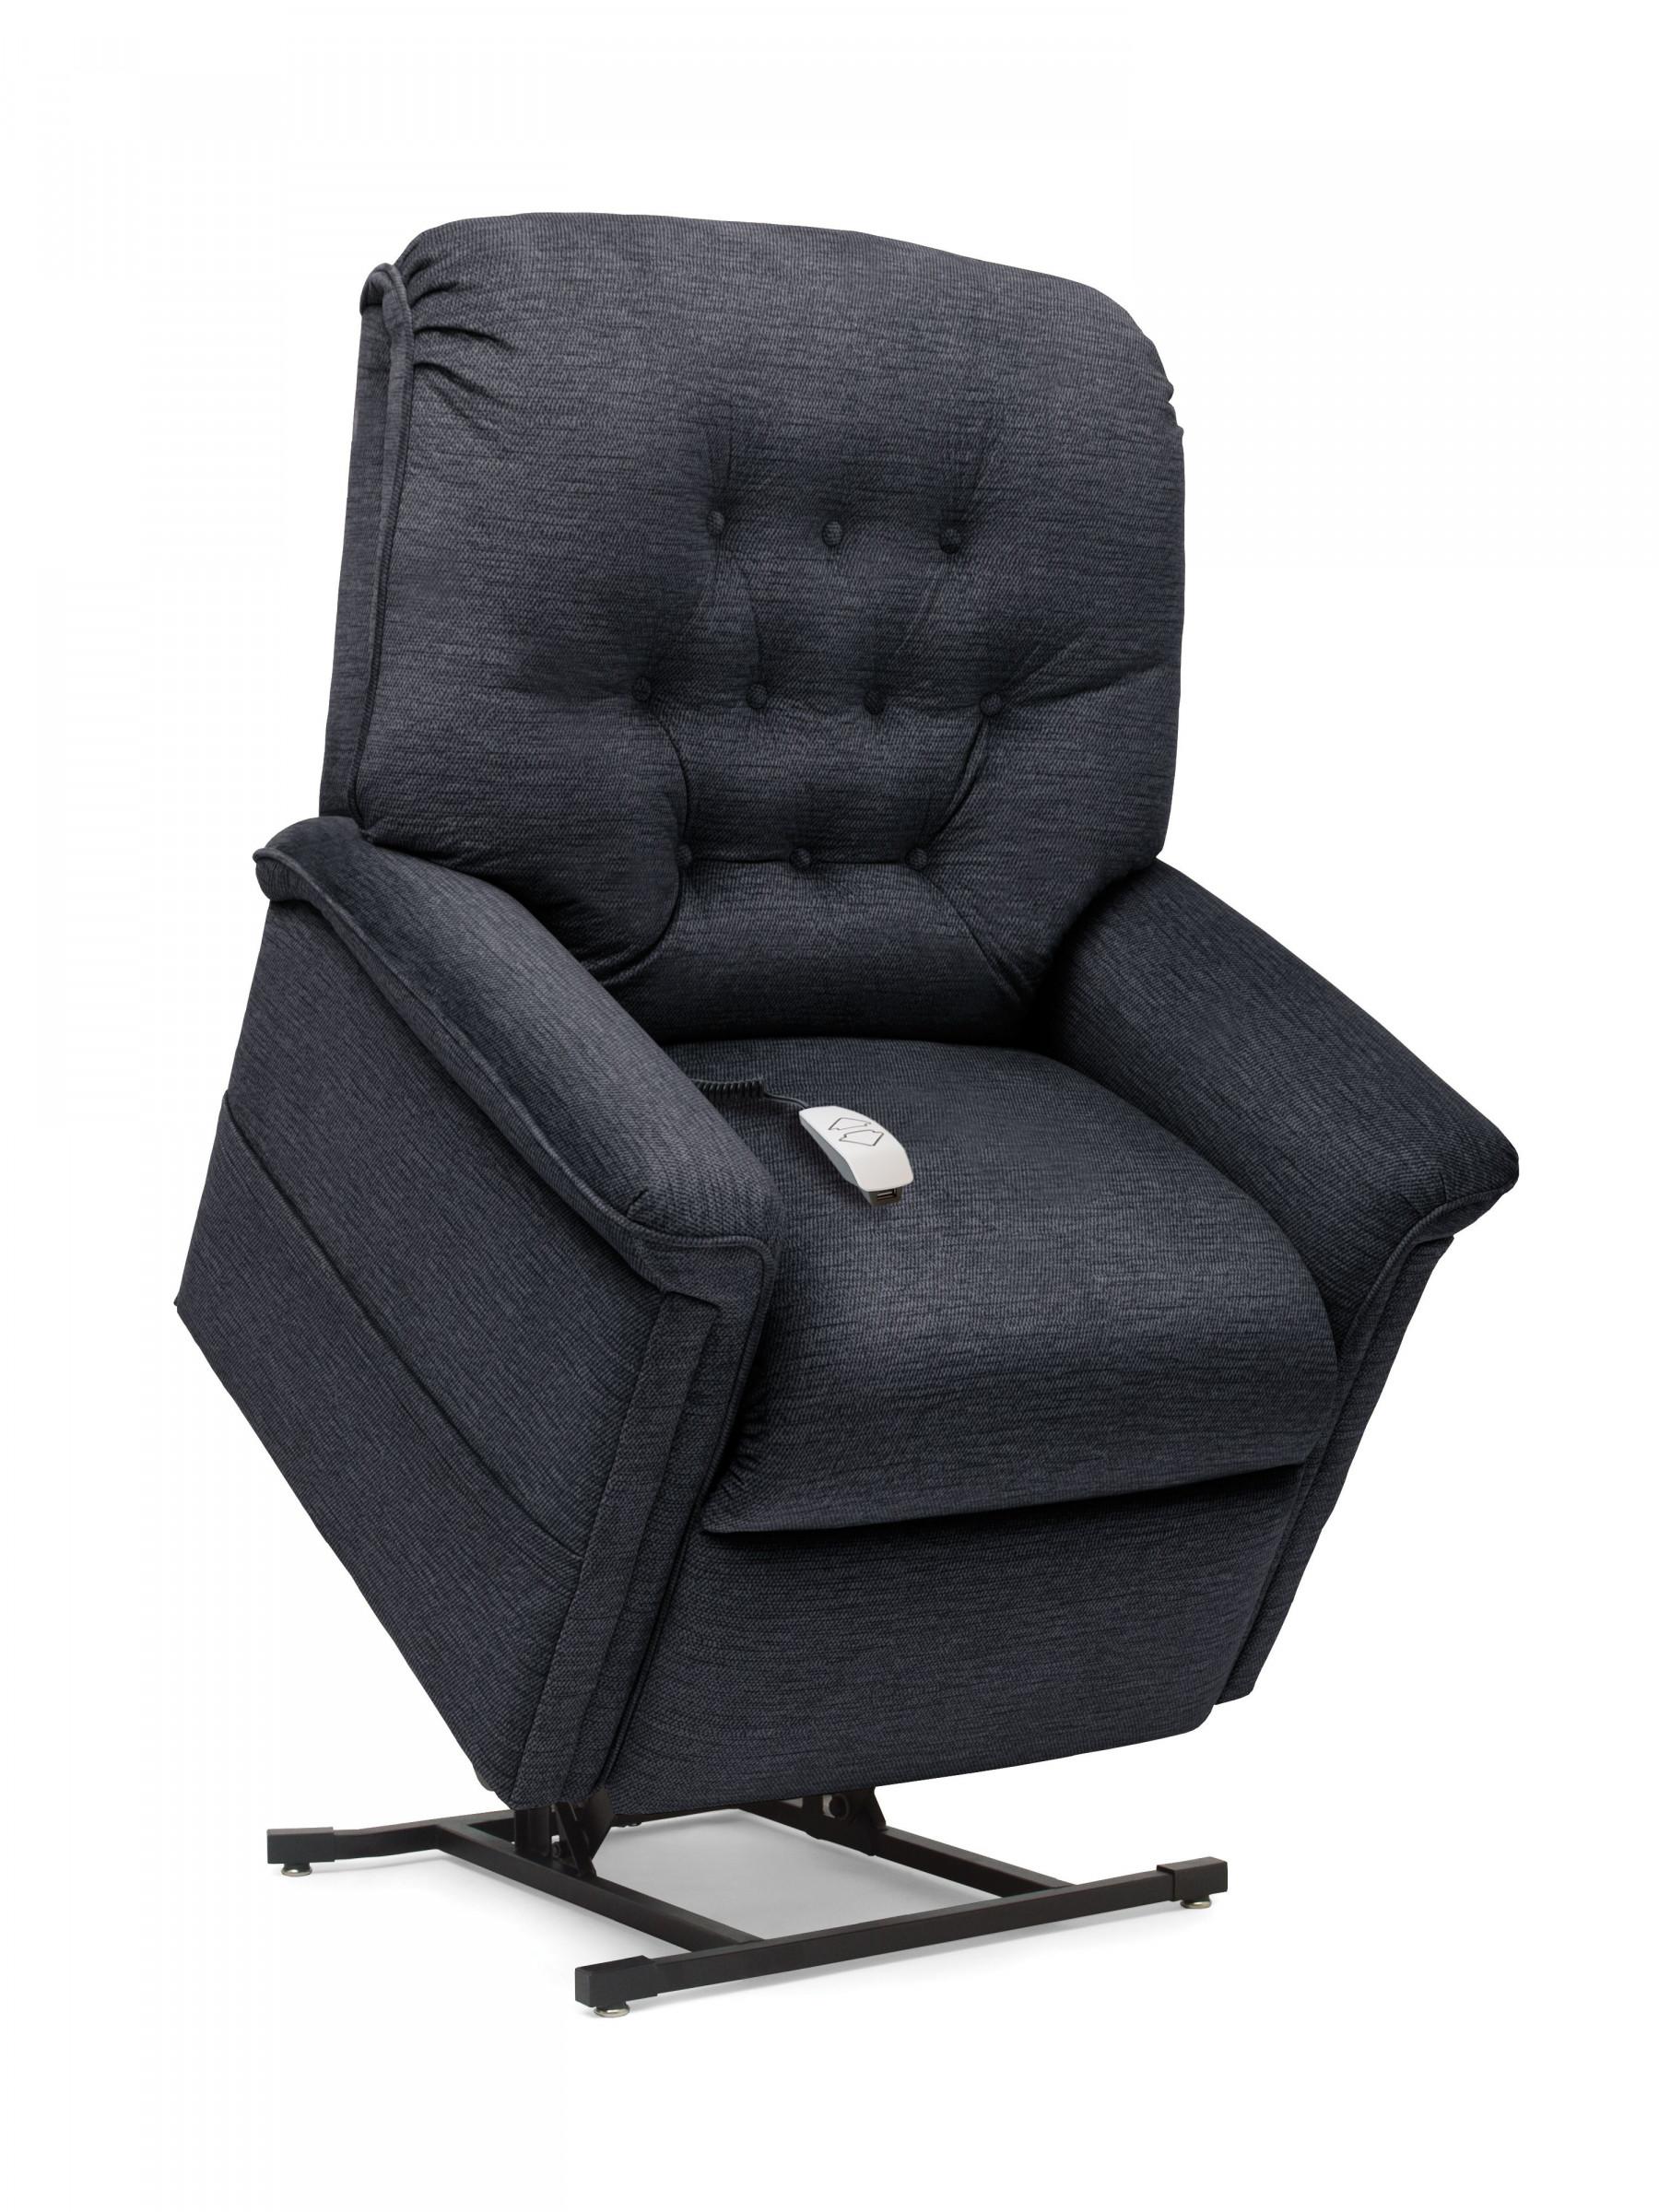 Pride Serenity SR 358 Lift Chair Best Price line Sales Direct